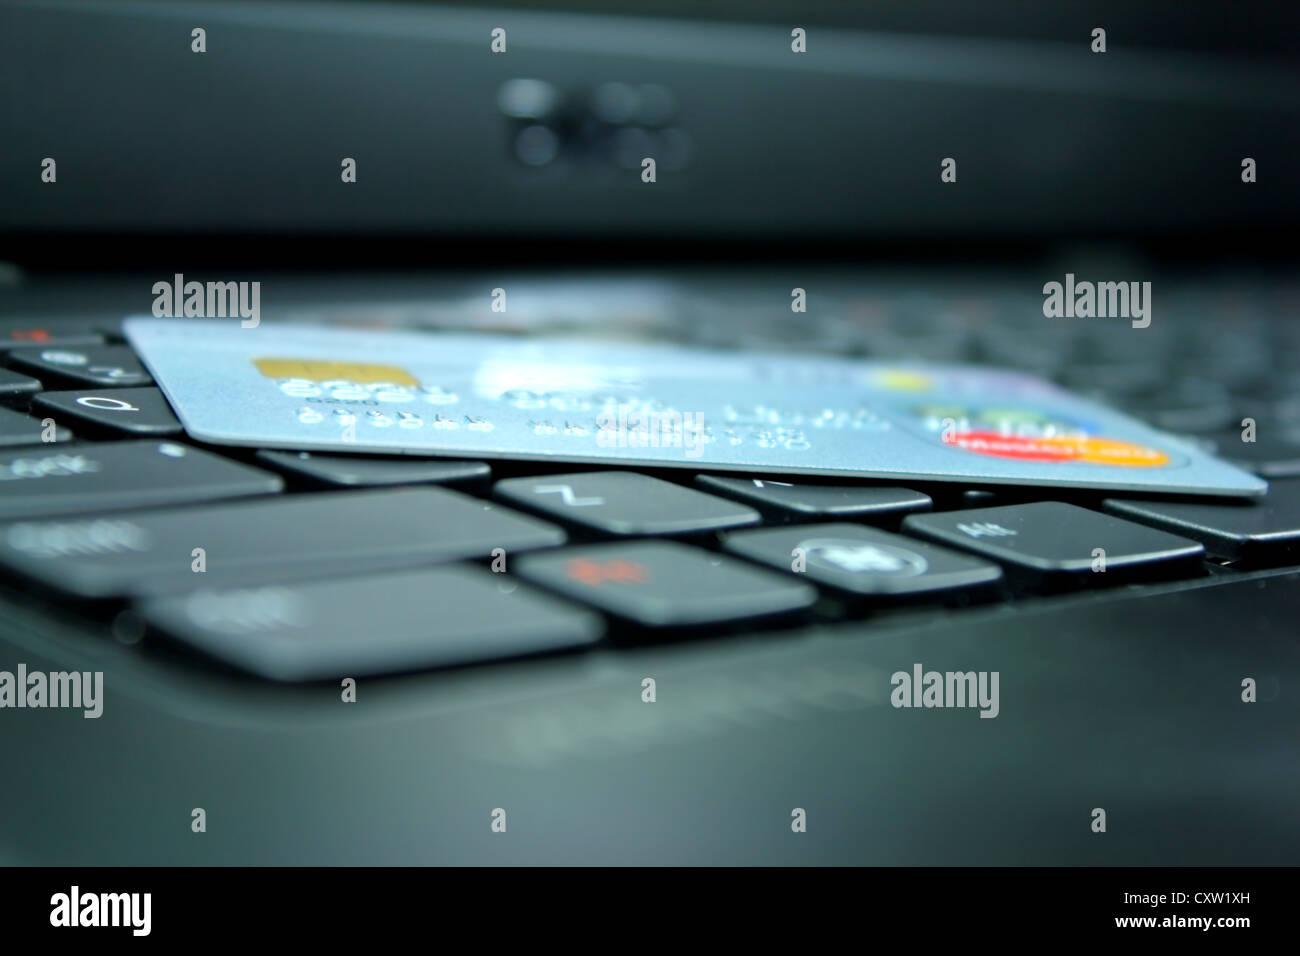 Kreditkarte auf der Tastatur Stockbild